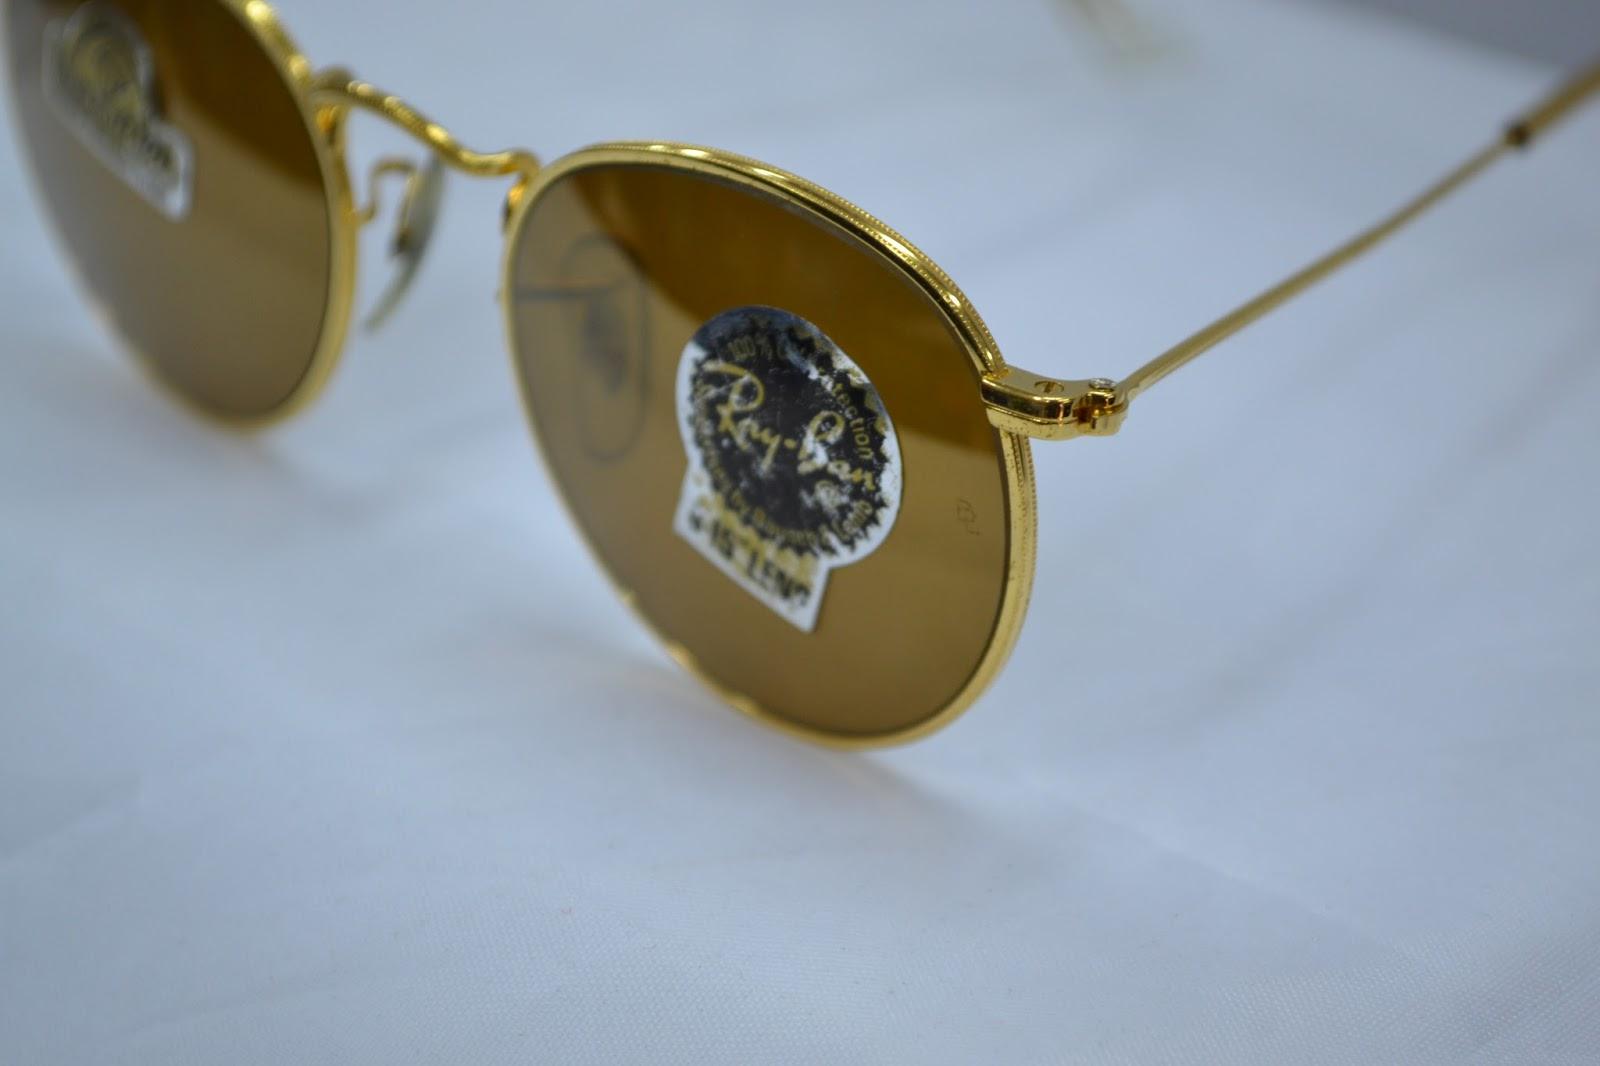 7a79930ae86 Vintage sunglass  Vintage Ray Ban diamond Hard Round sunglass ...